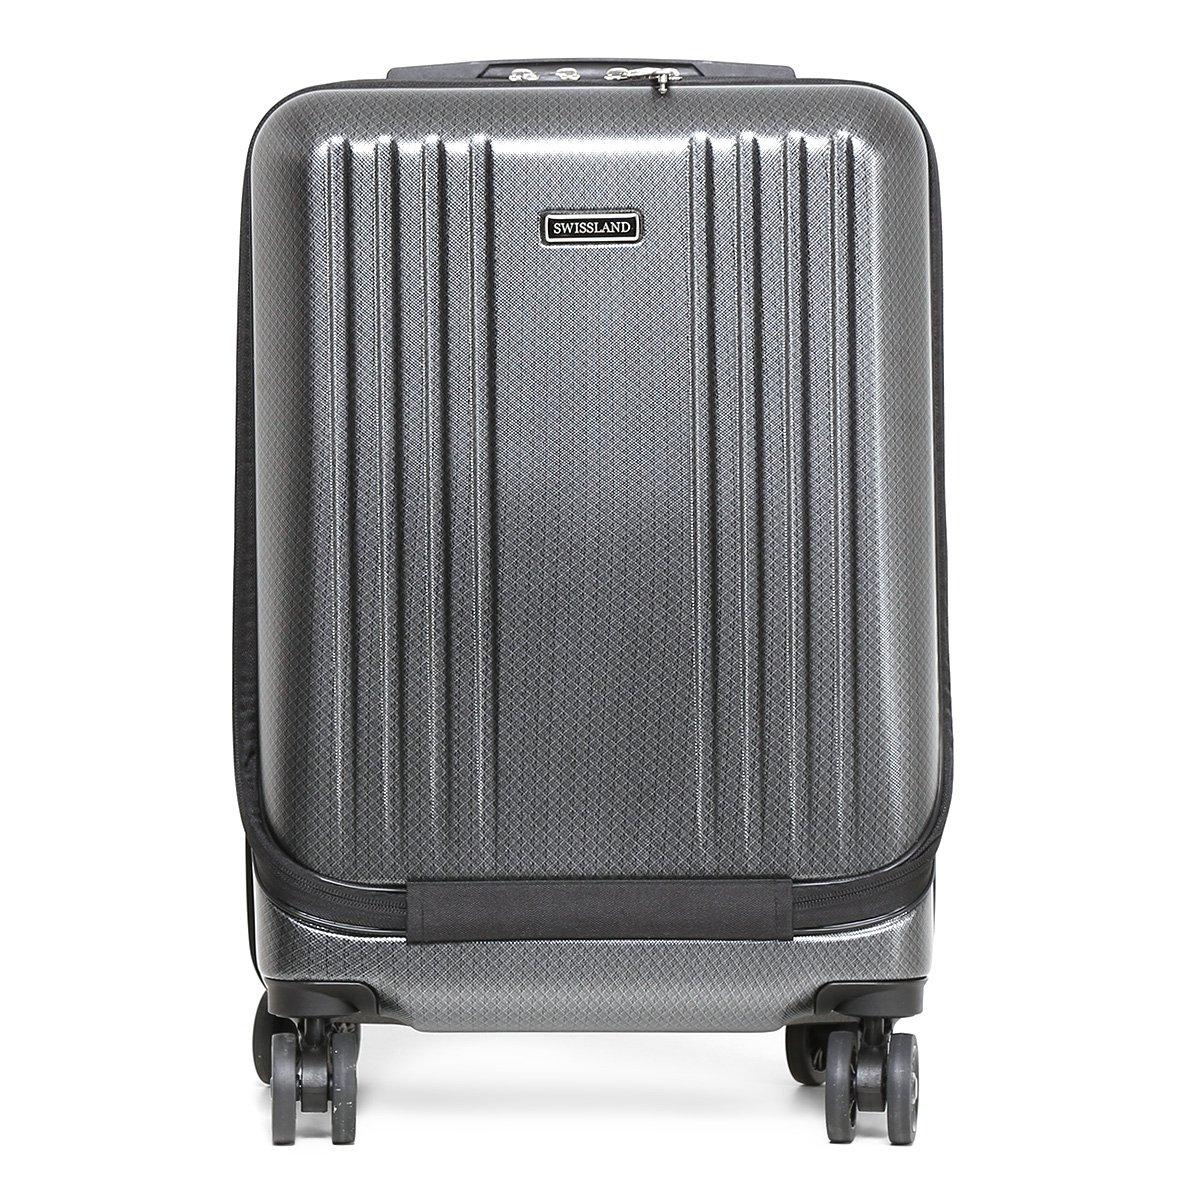 Mala de Viagem Yins brasil Bordo 20 ABS Compartimento Note